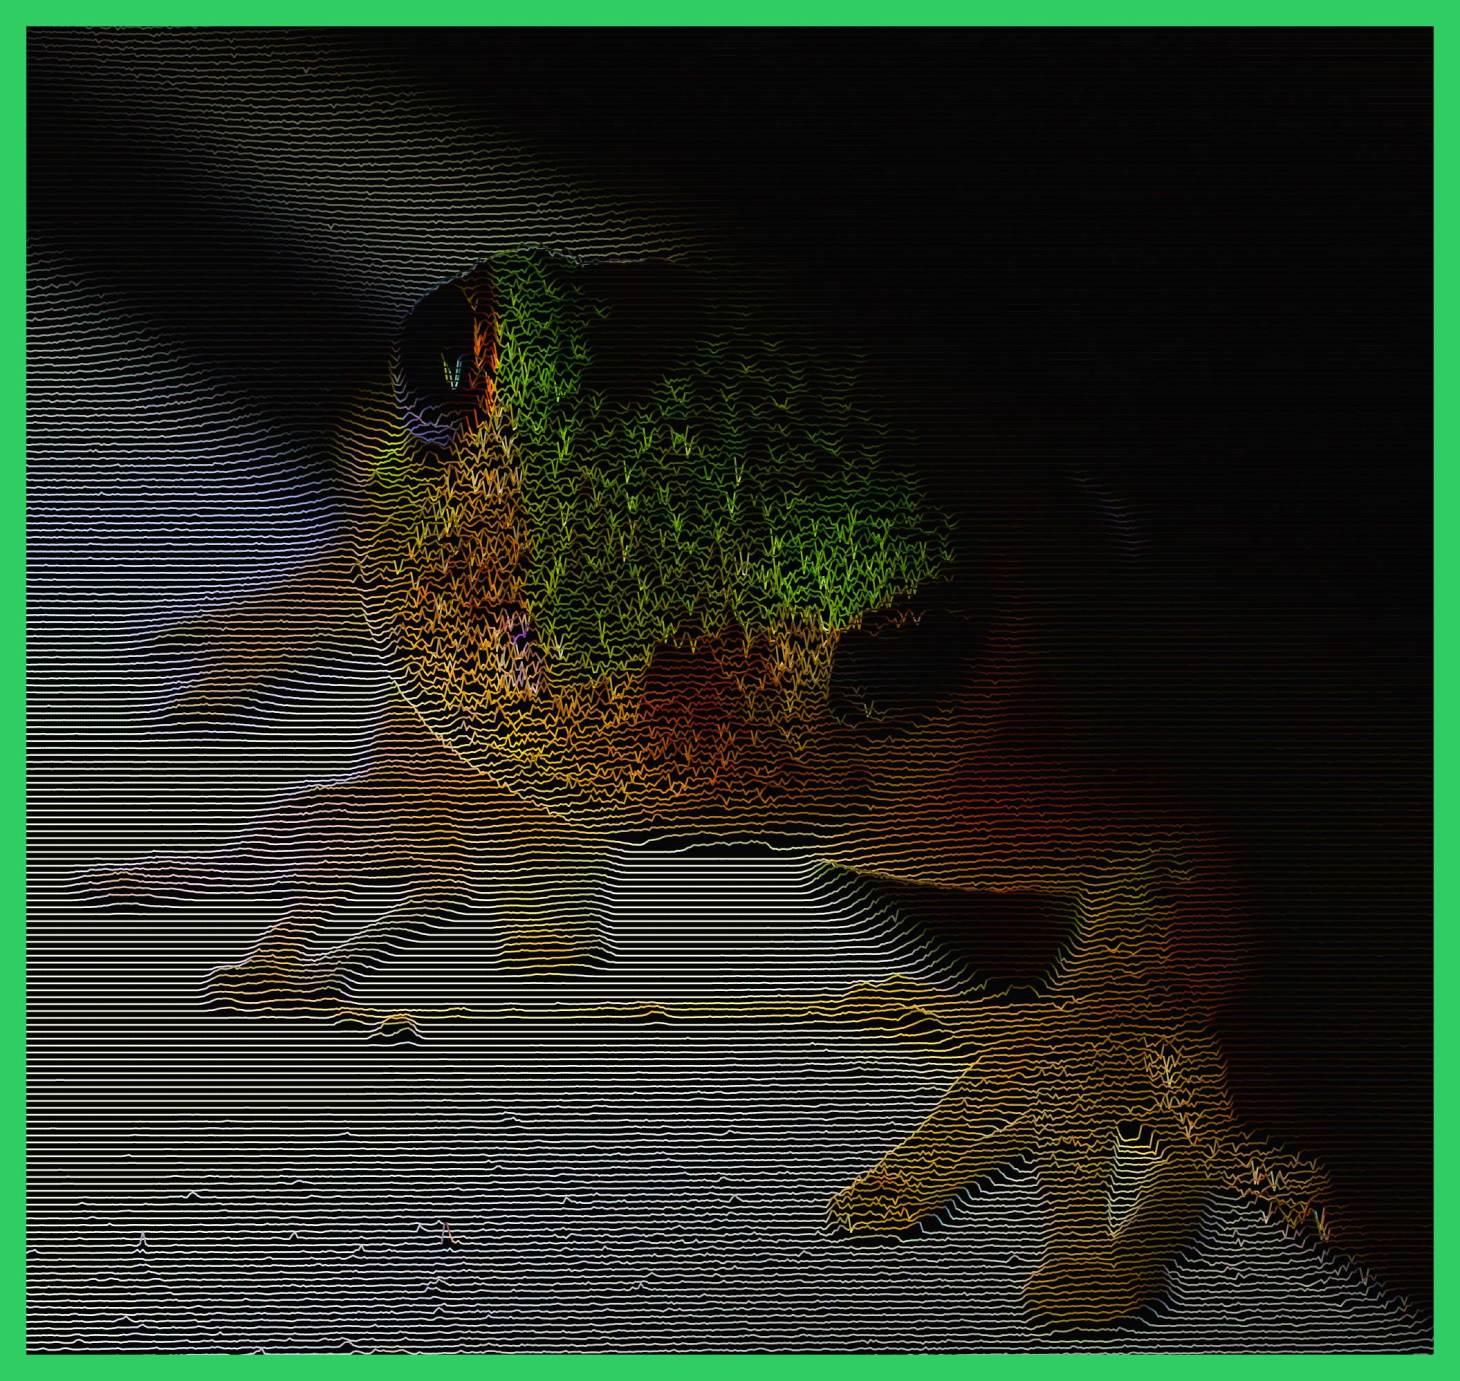 Tree Frog climbing around the porch (2). Photo by Thomas Peace c. 2015